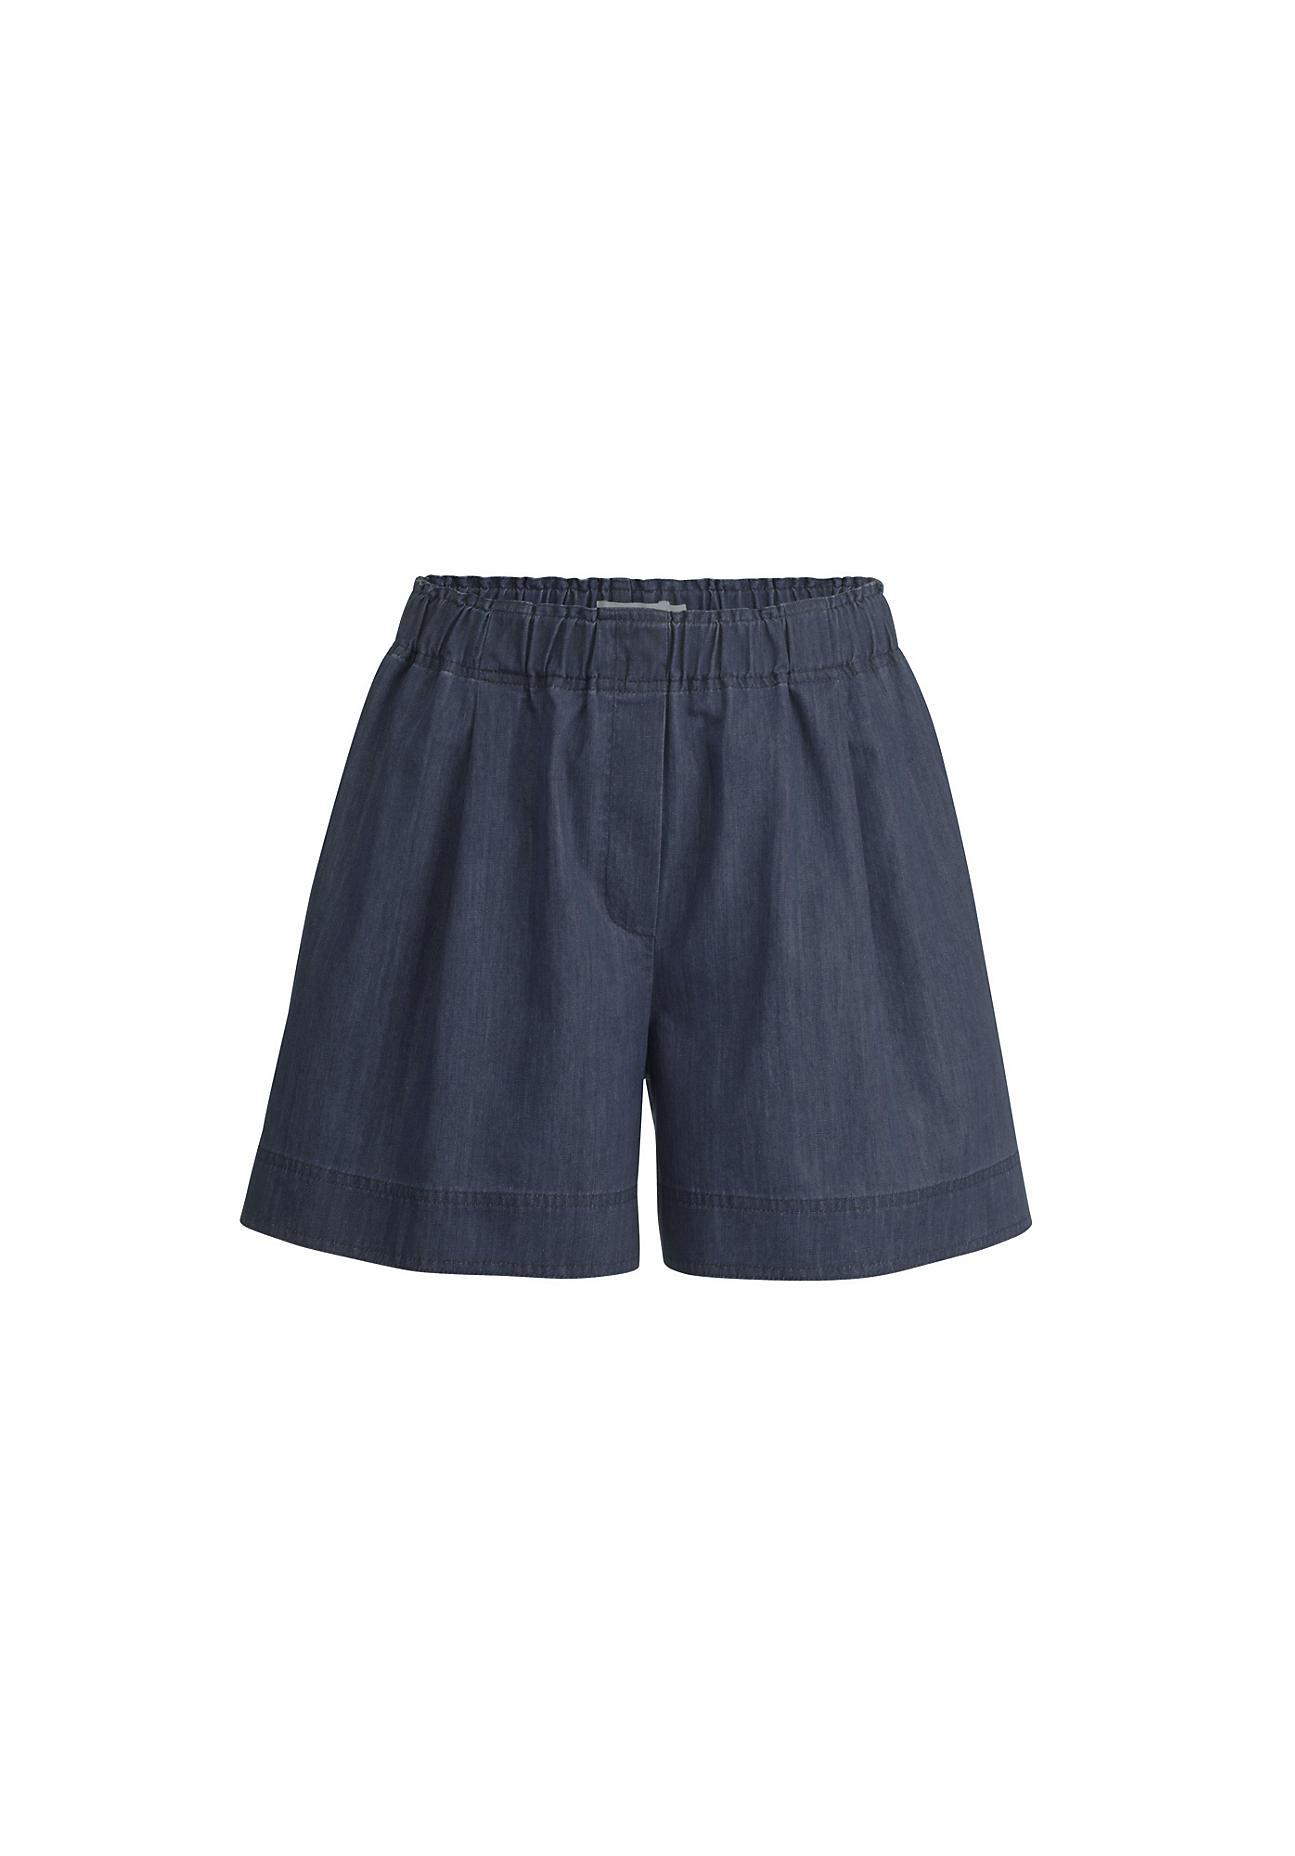 Hosen - hessnatur Damen Jeans Shorts aus Bio Denim – blau –  - Onlineshop Hessnatur